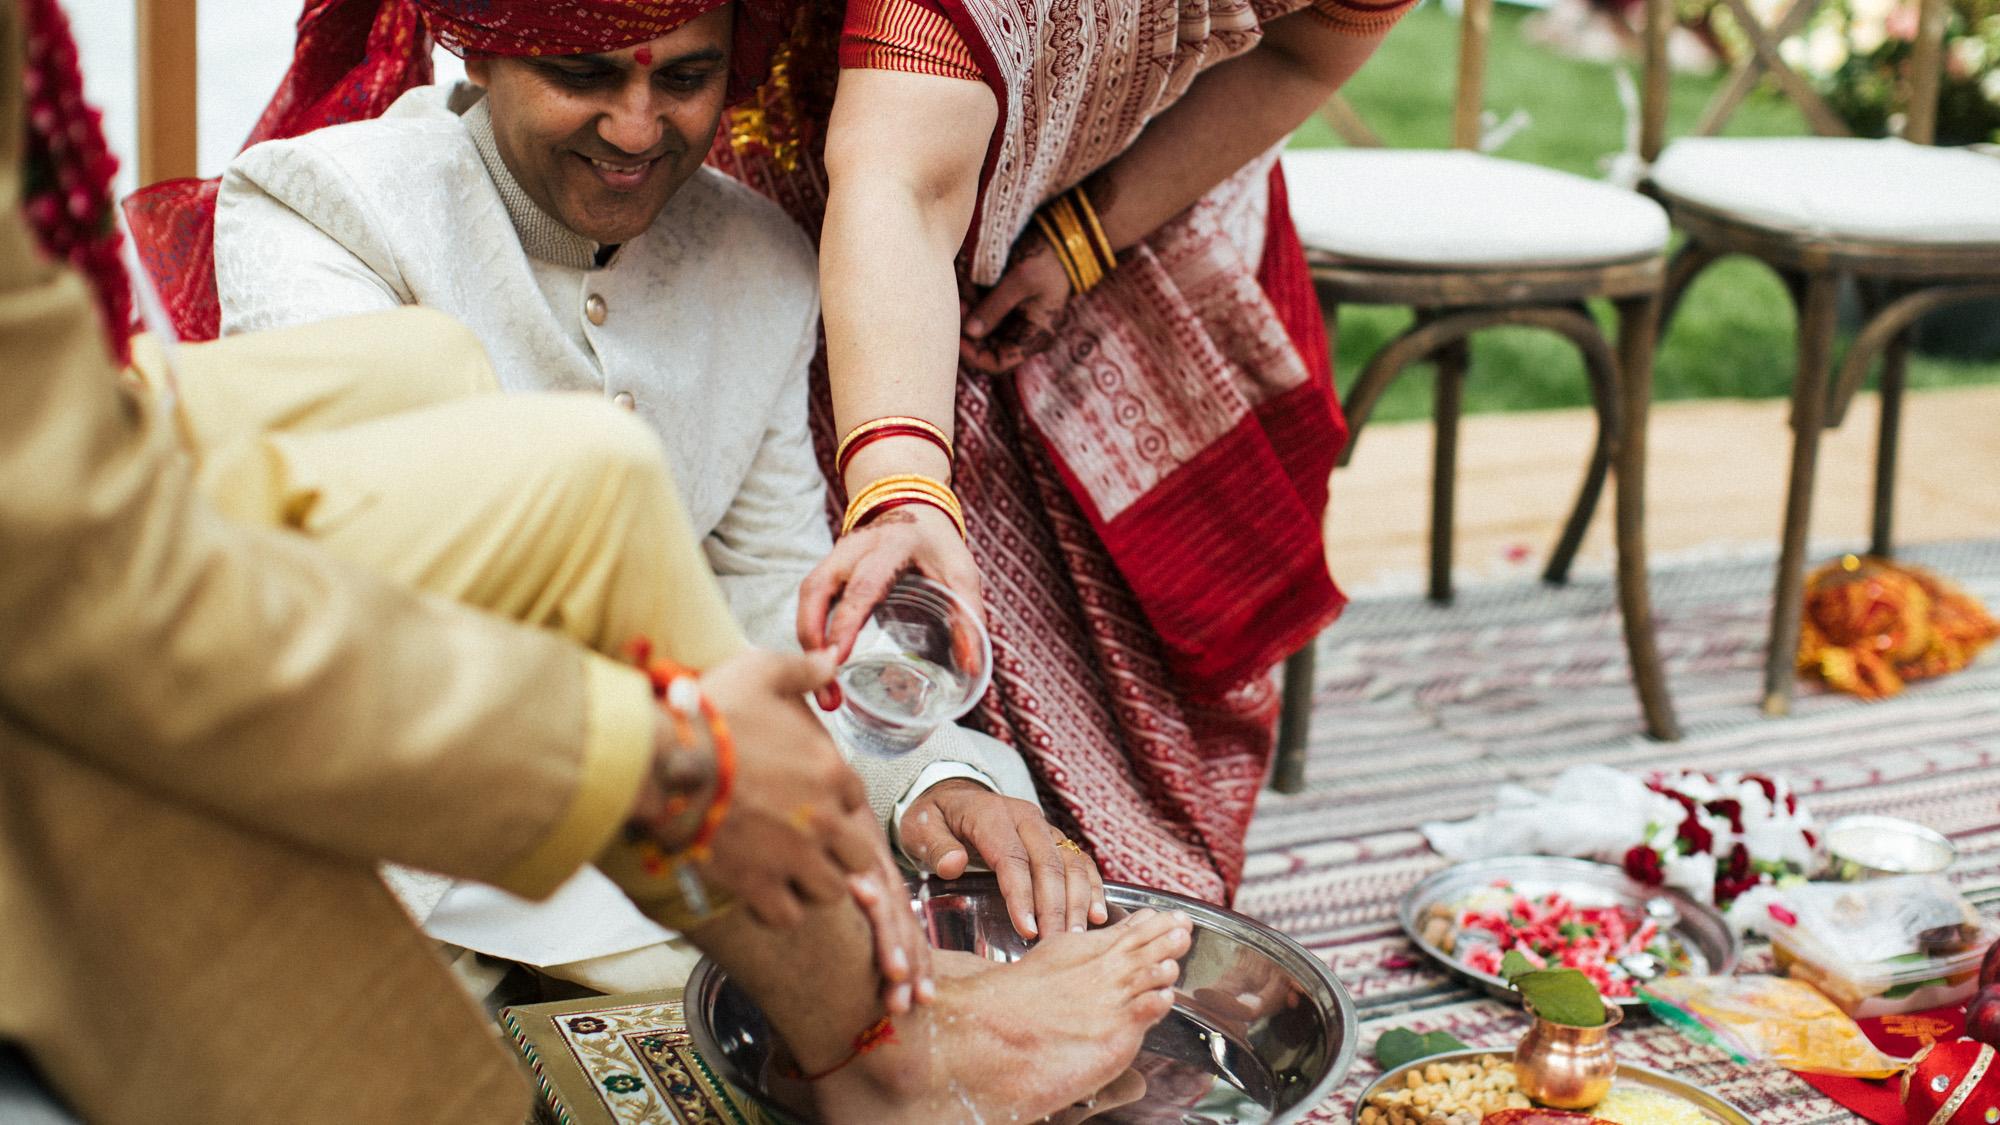 anu_maneesh_alec_vanderboom_Indian_wedding_photography-0094.jpg